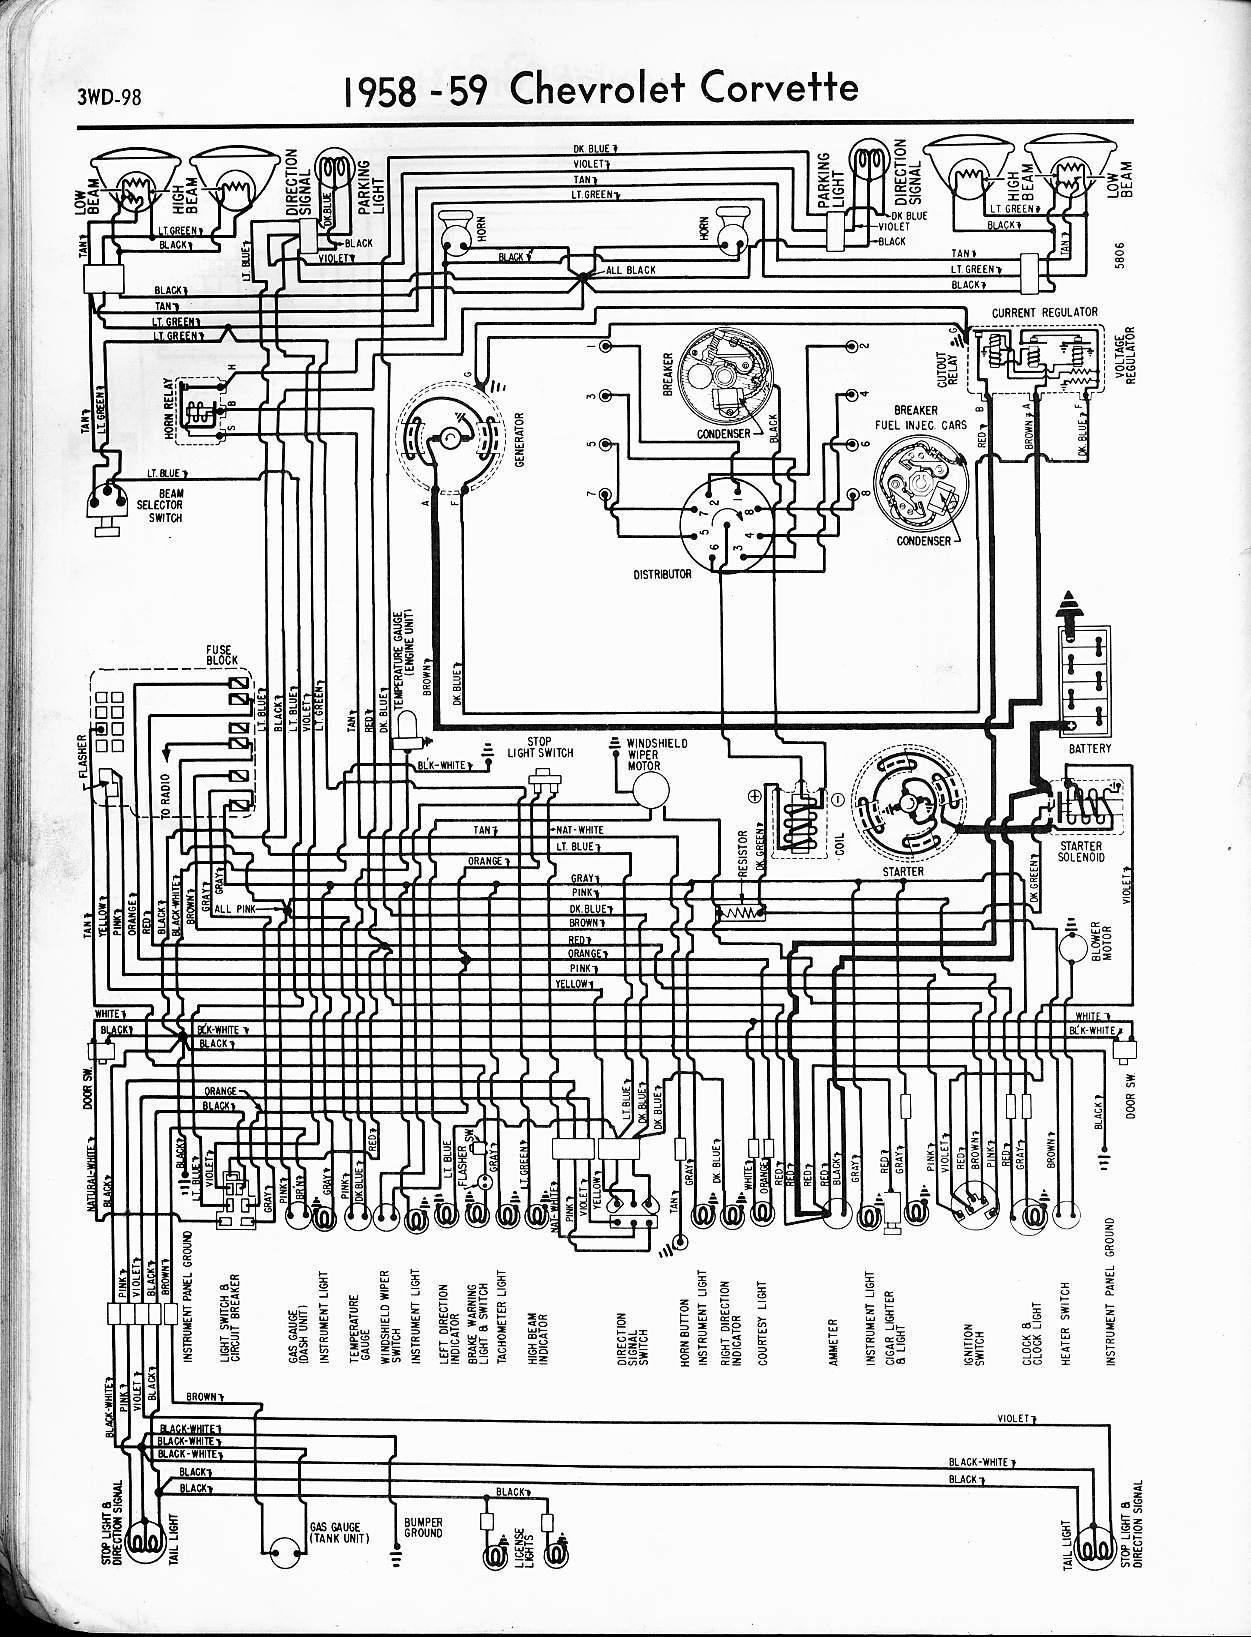 Chovrolete 59 Mwirechev58 3wd 098 1  Jpg Diagramas De Autos